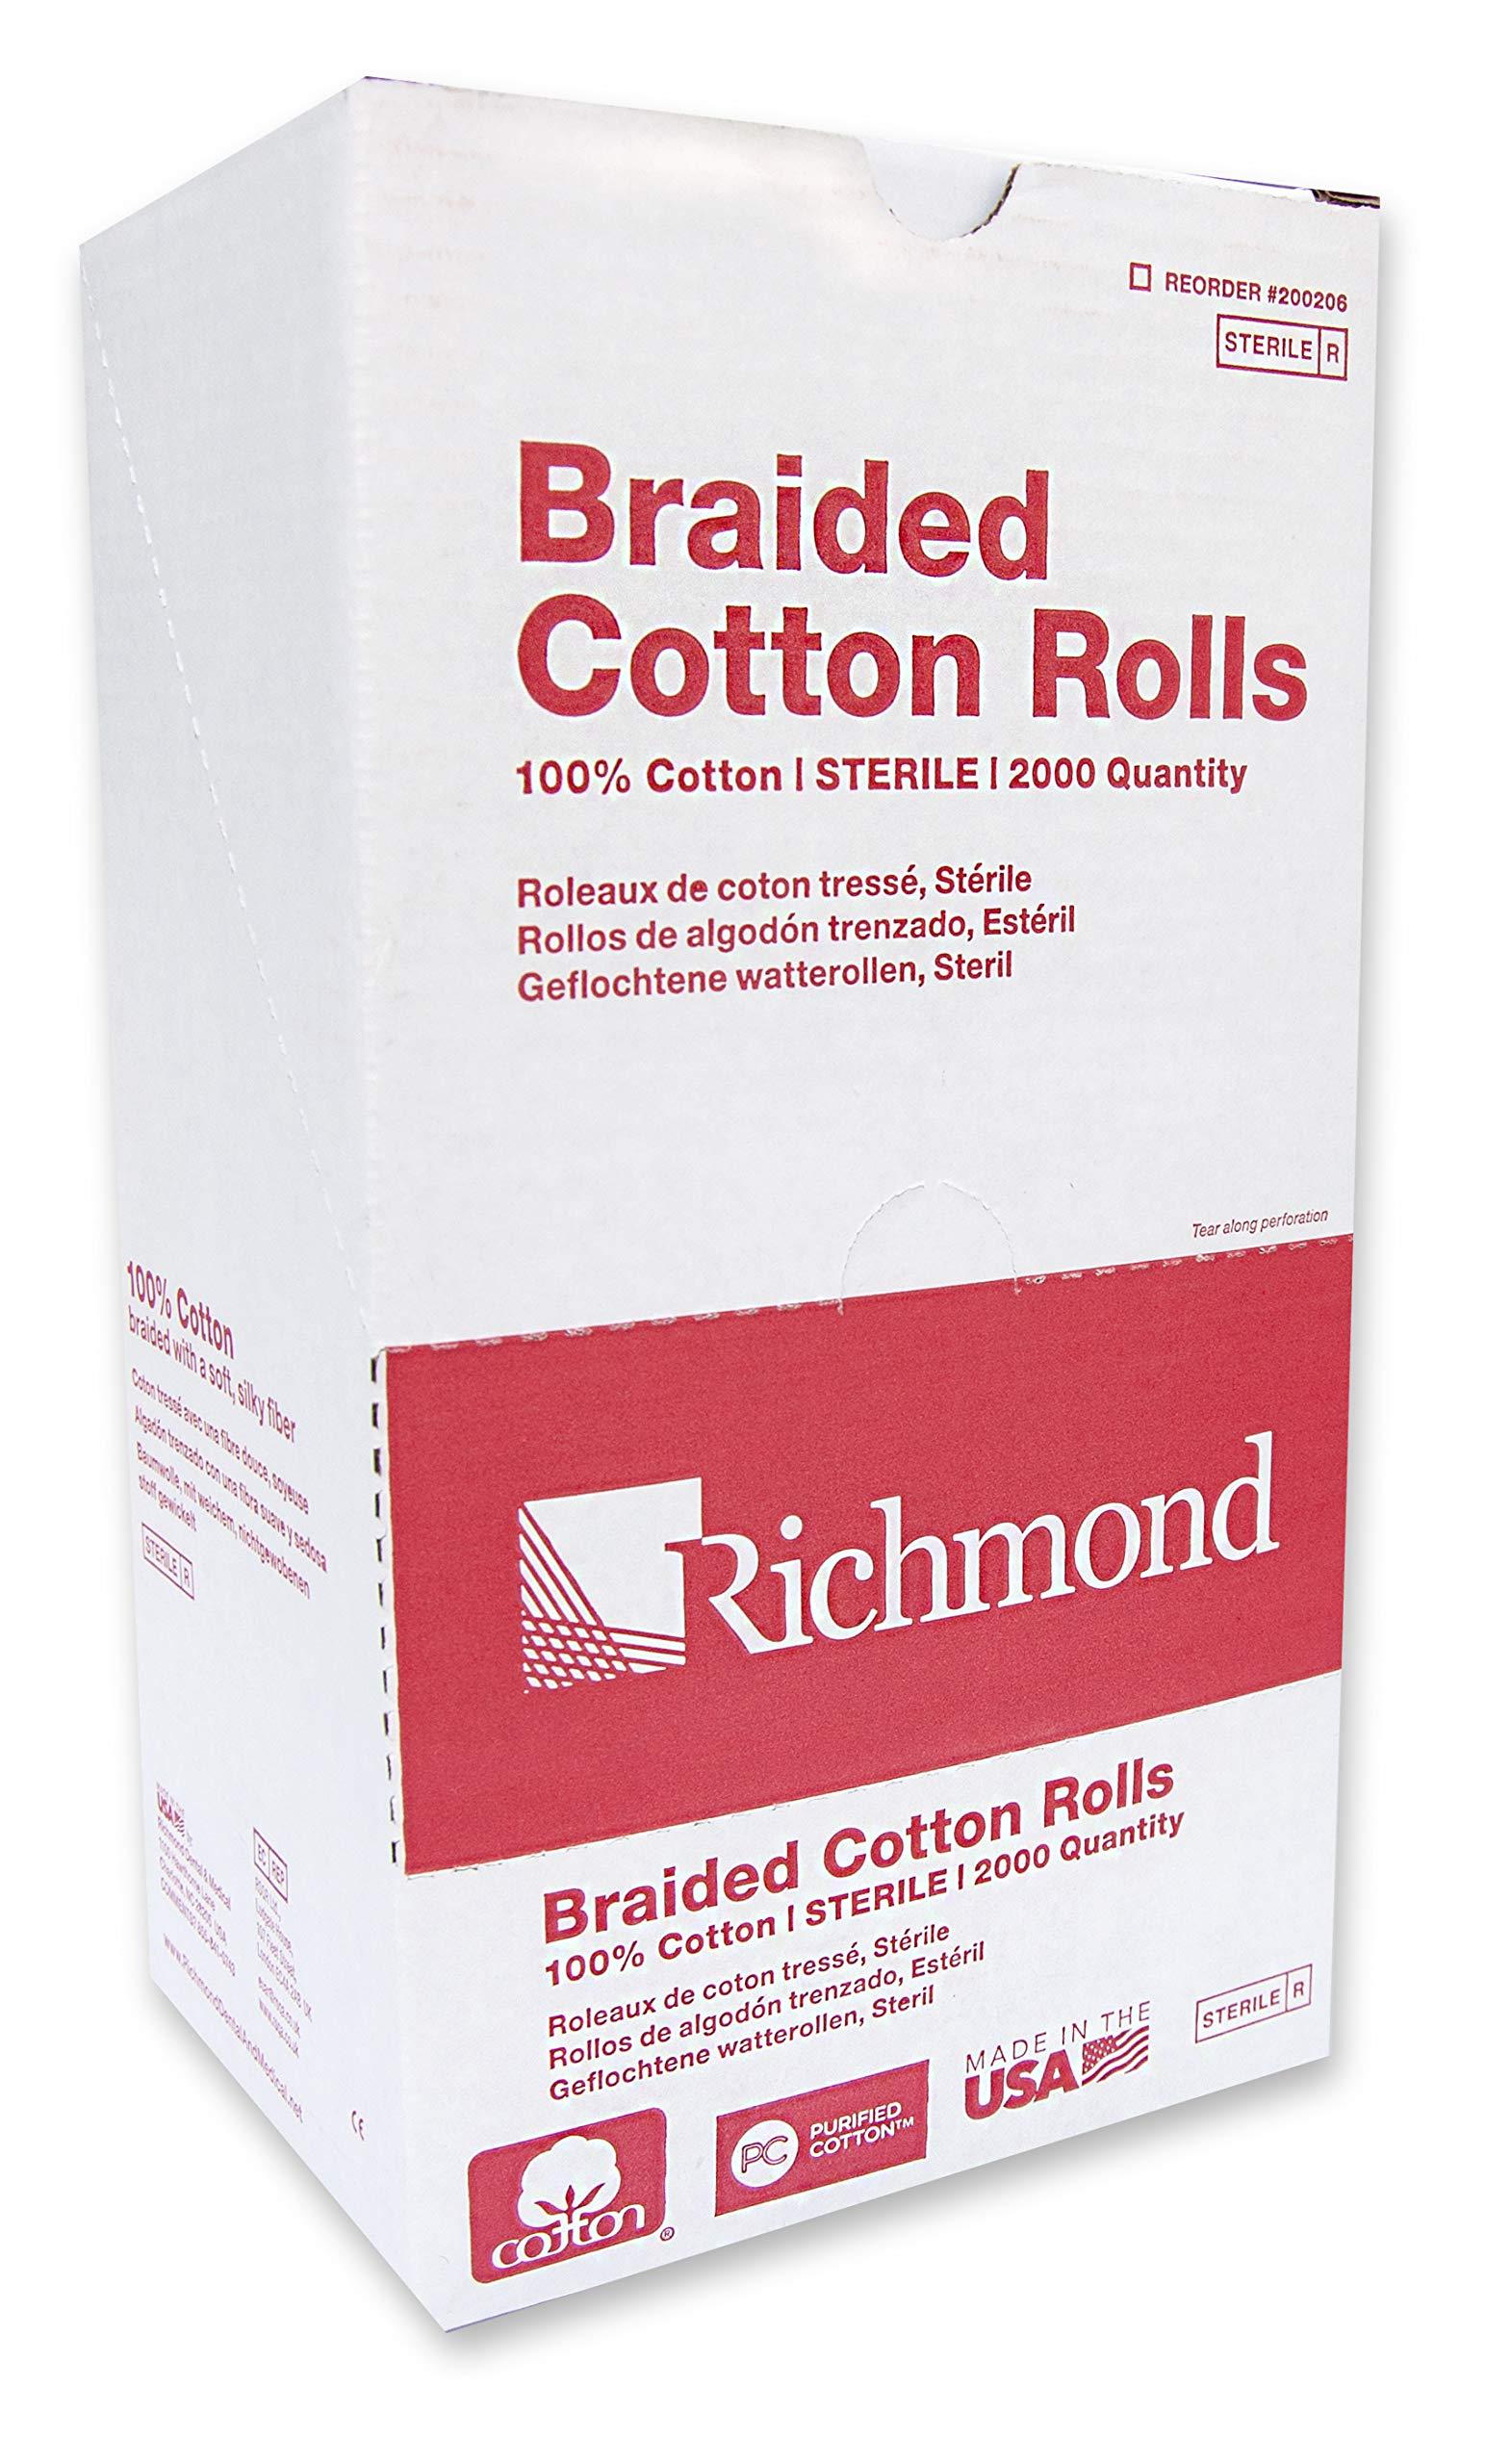 Richmond Dental & Medical 200206 1.5'', Medium Braided Cotton Roll, Sterile by Richmond Dental & Medical (Image #1)